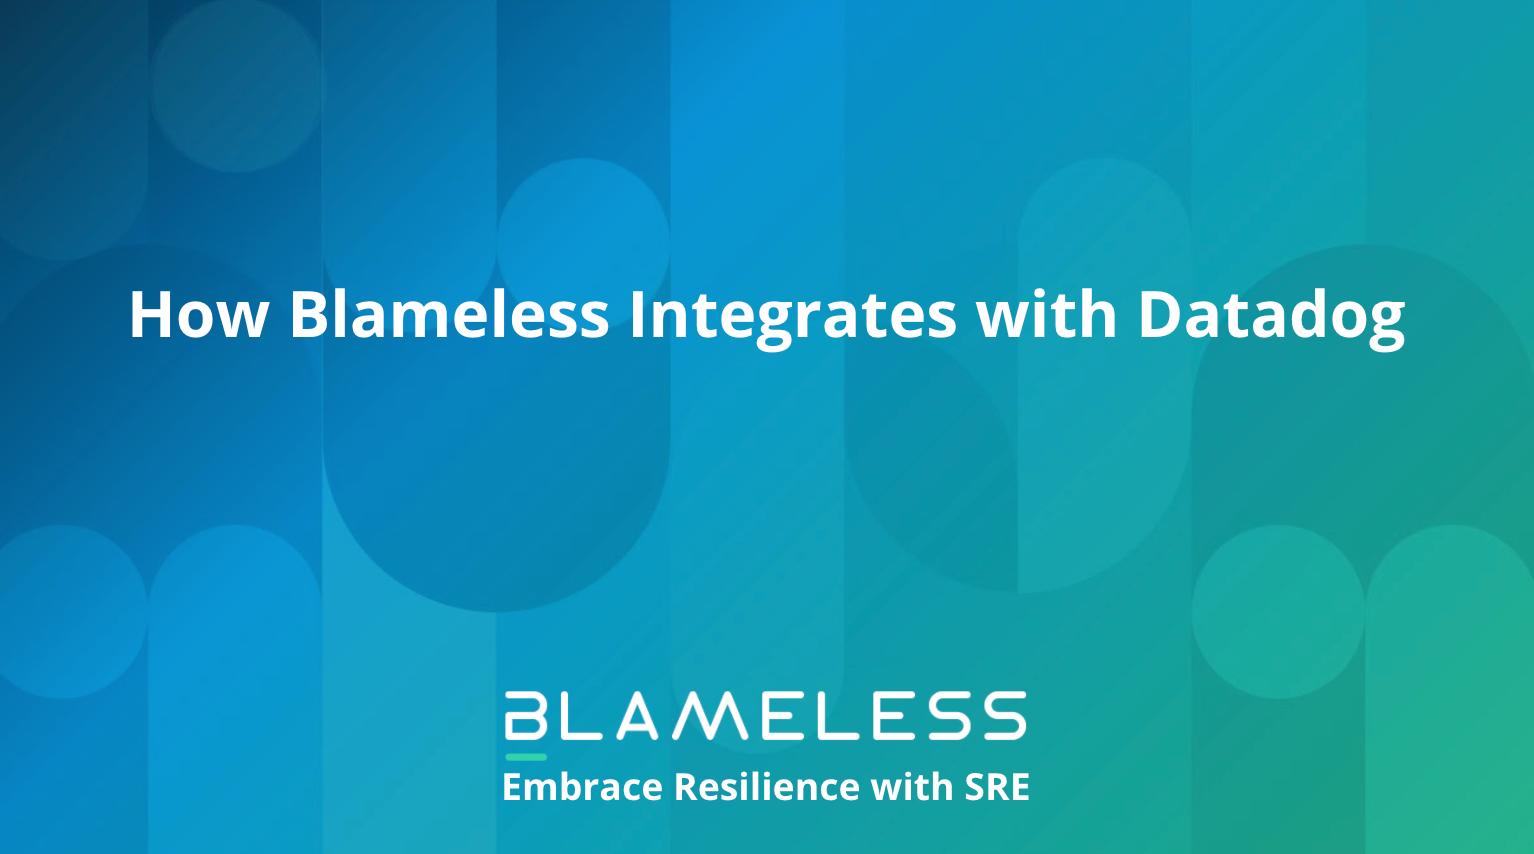 How Blameless Integrates with Datadog